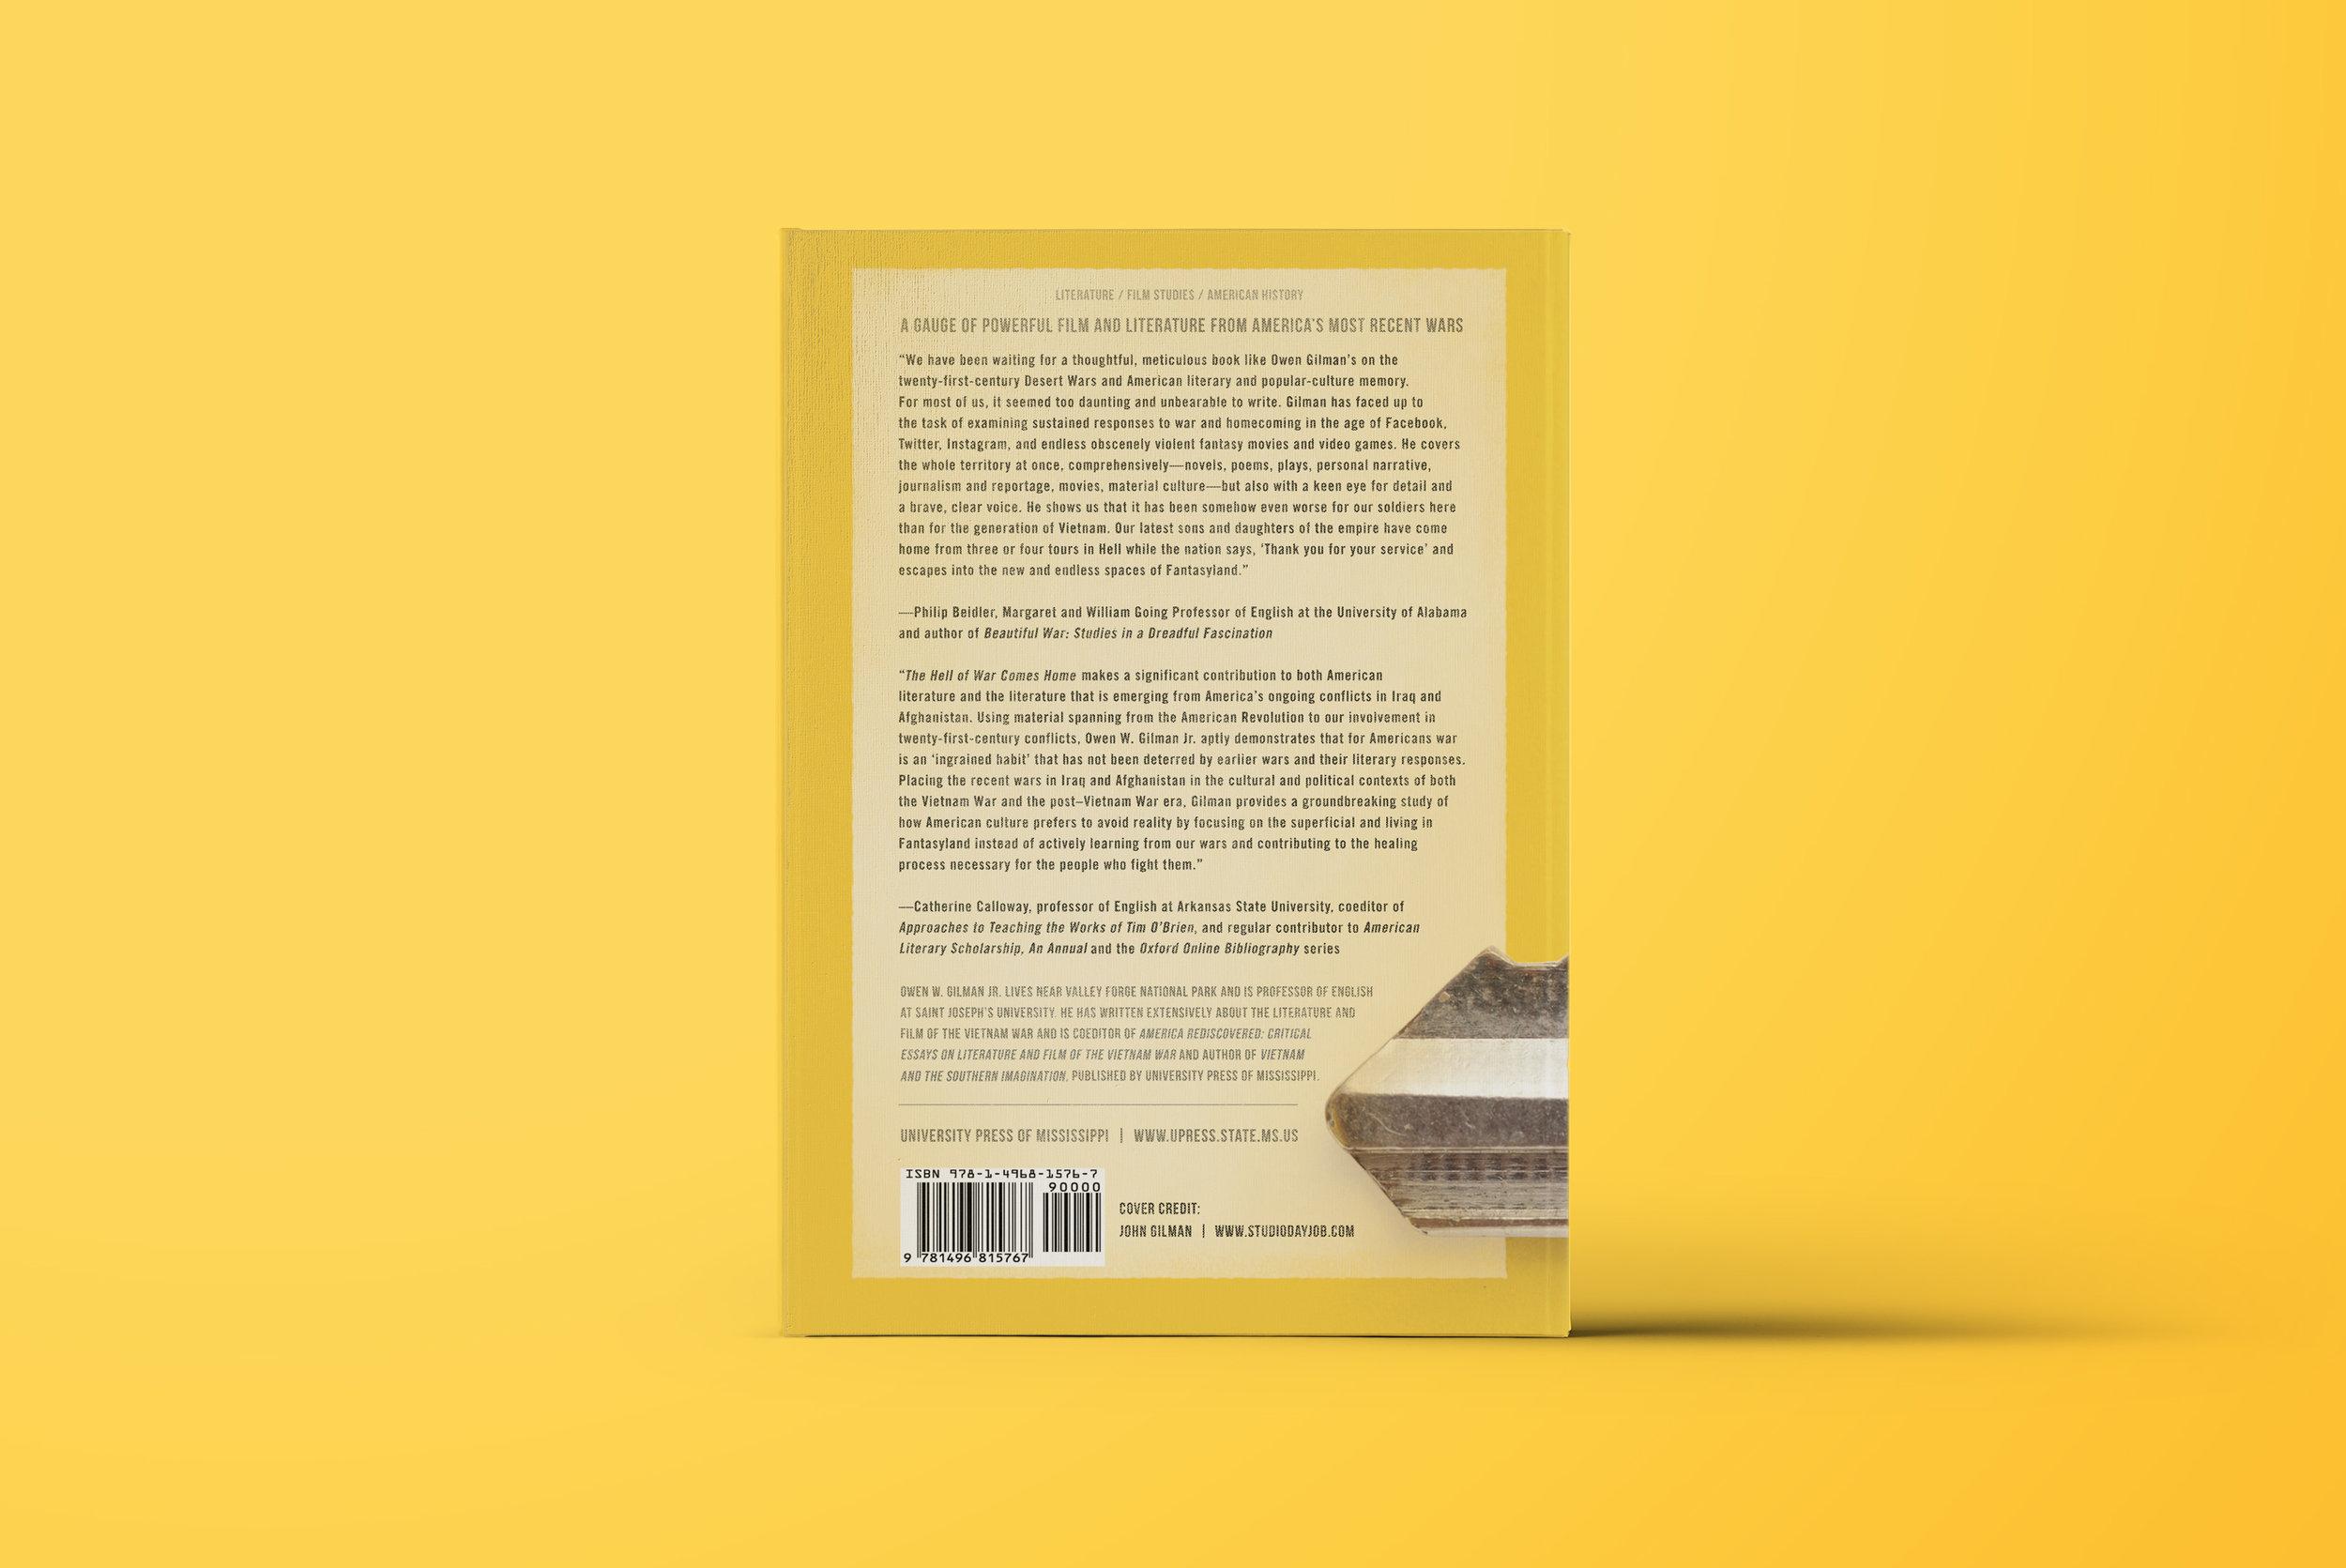 Hell_Of_War_Book_Cover_02.jpg